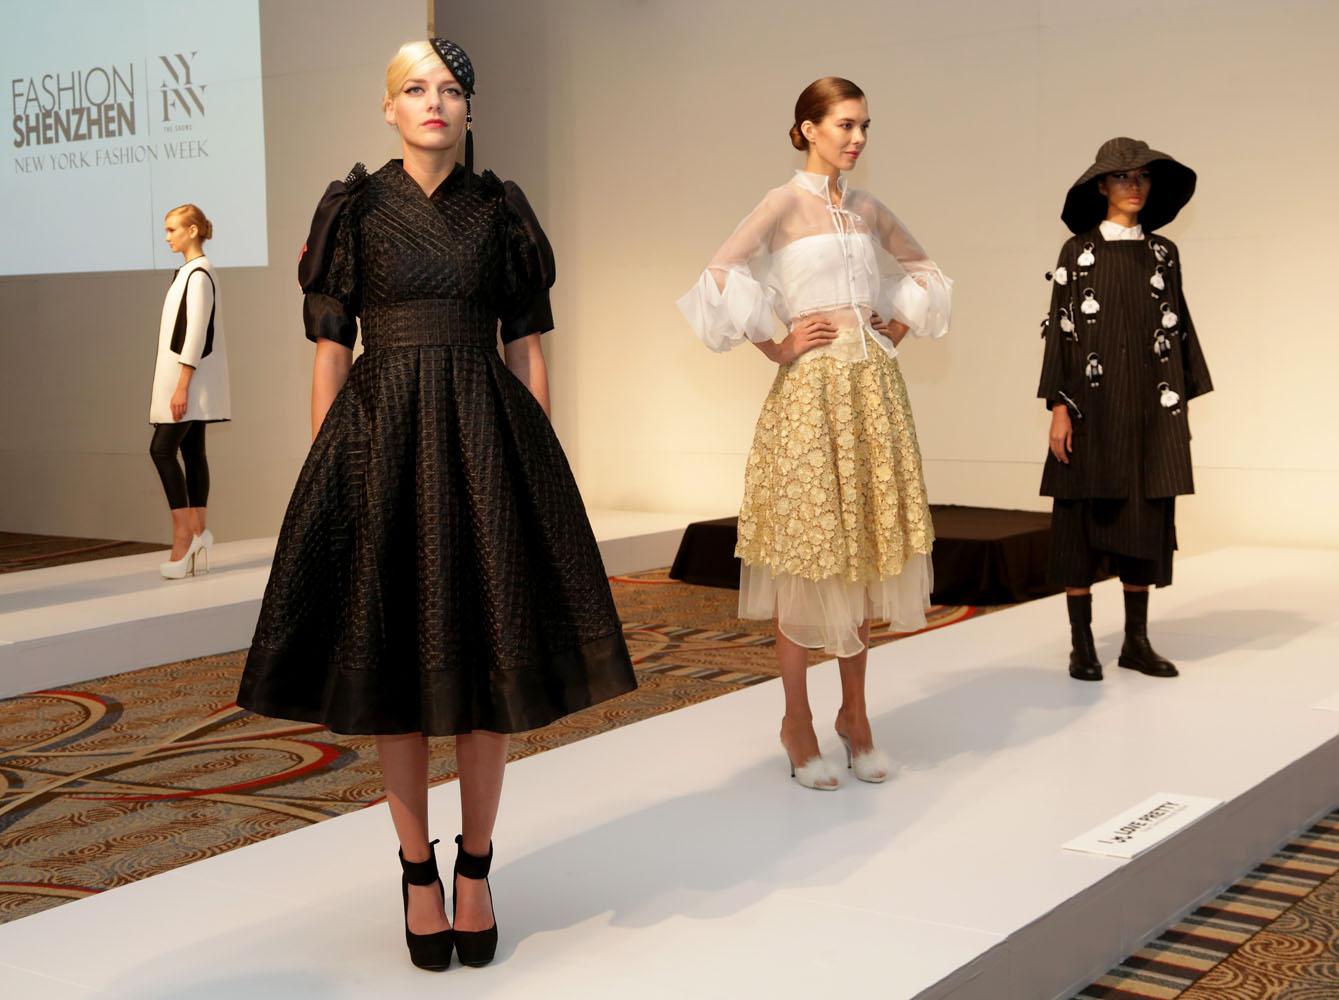 Fashion Shenzhen Emerging Designers Presentation Spring 2016 New York Fashion Week The Shows